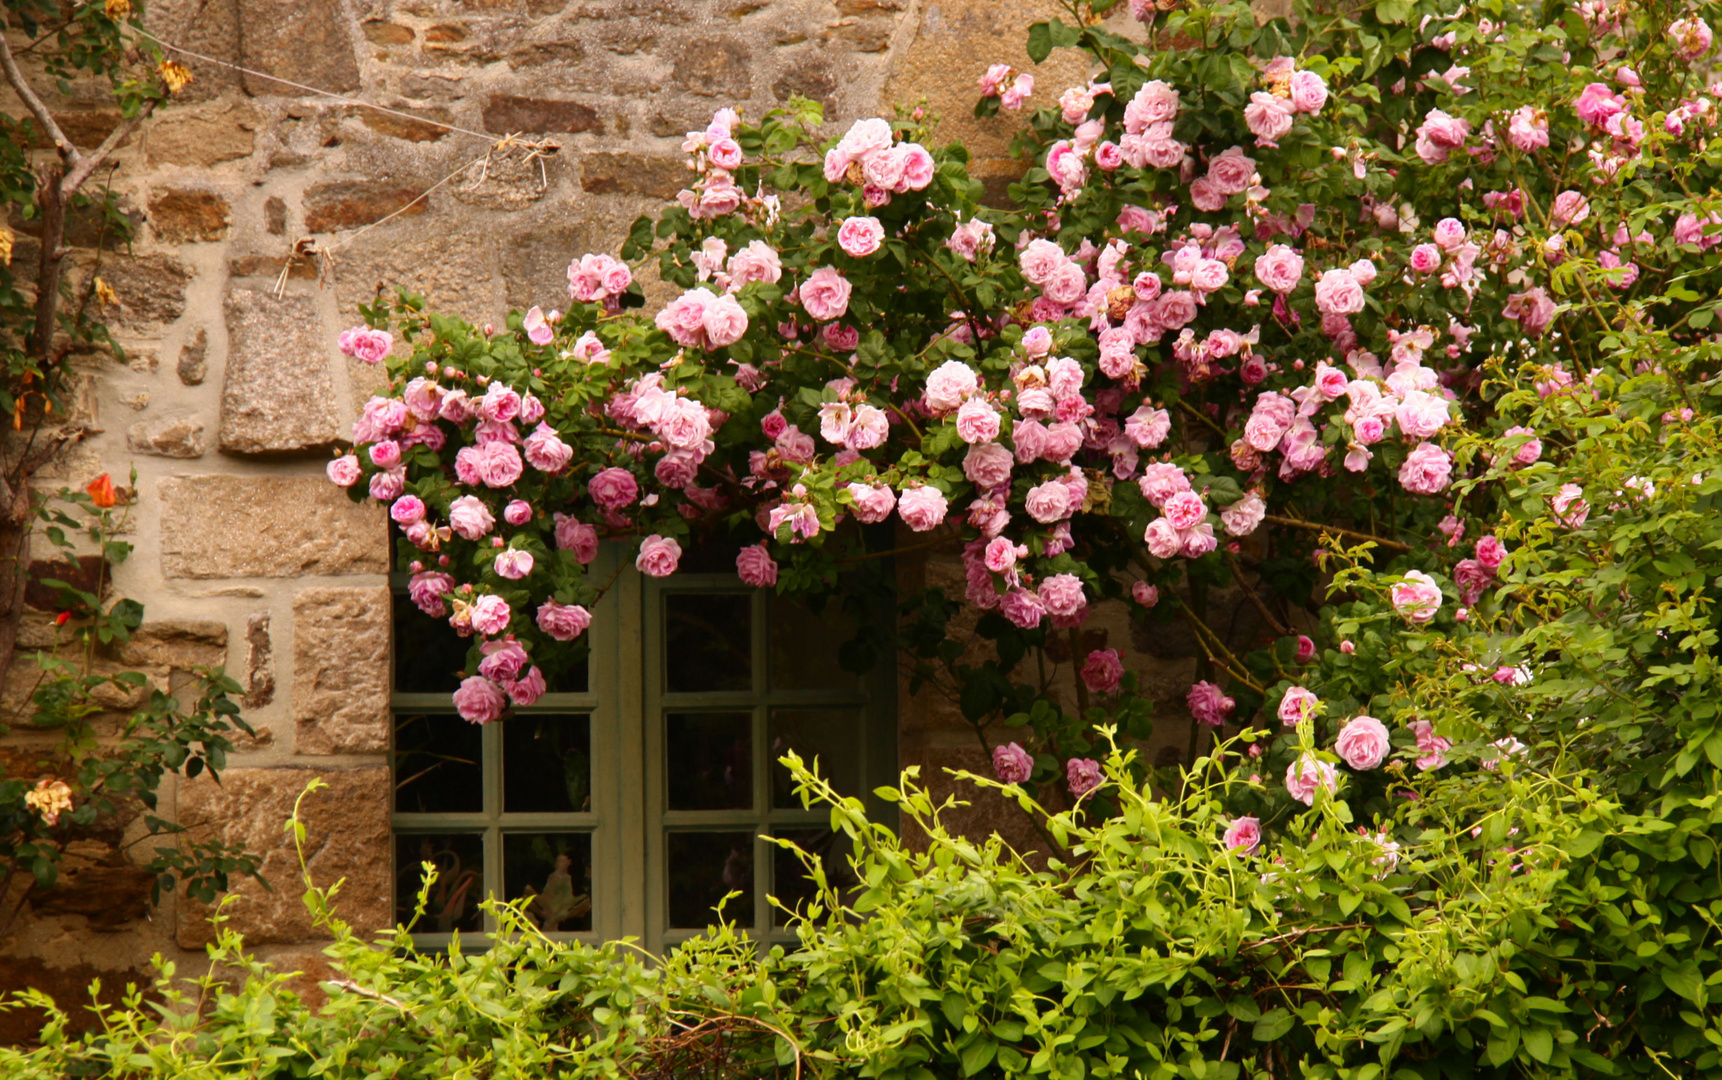 des roses à perte de vue!